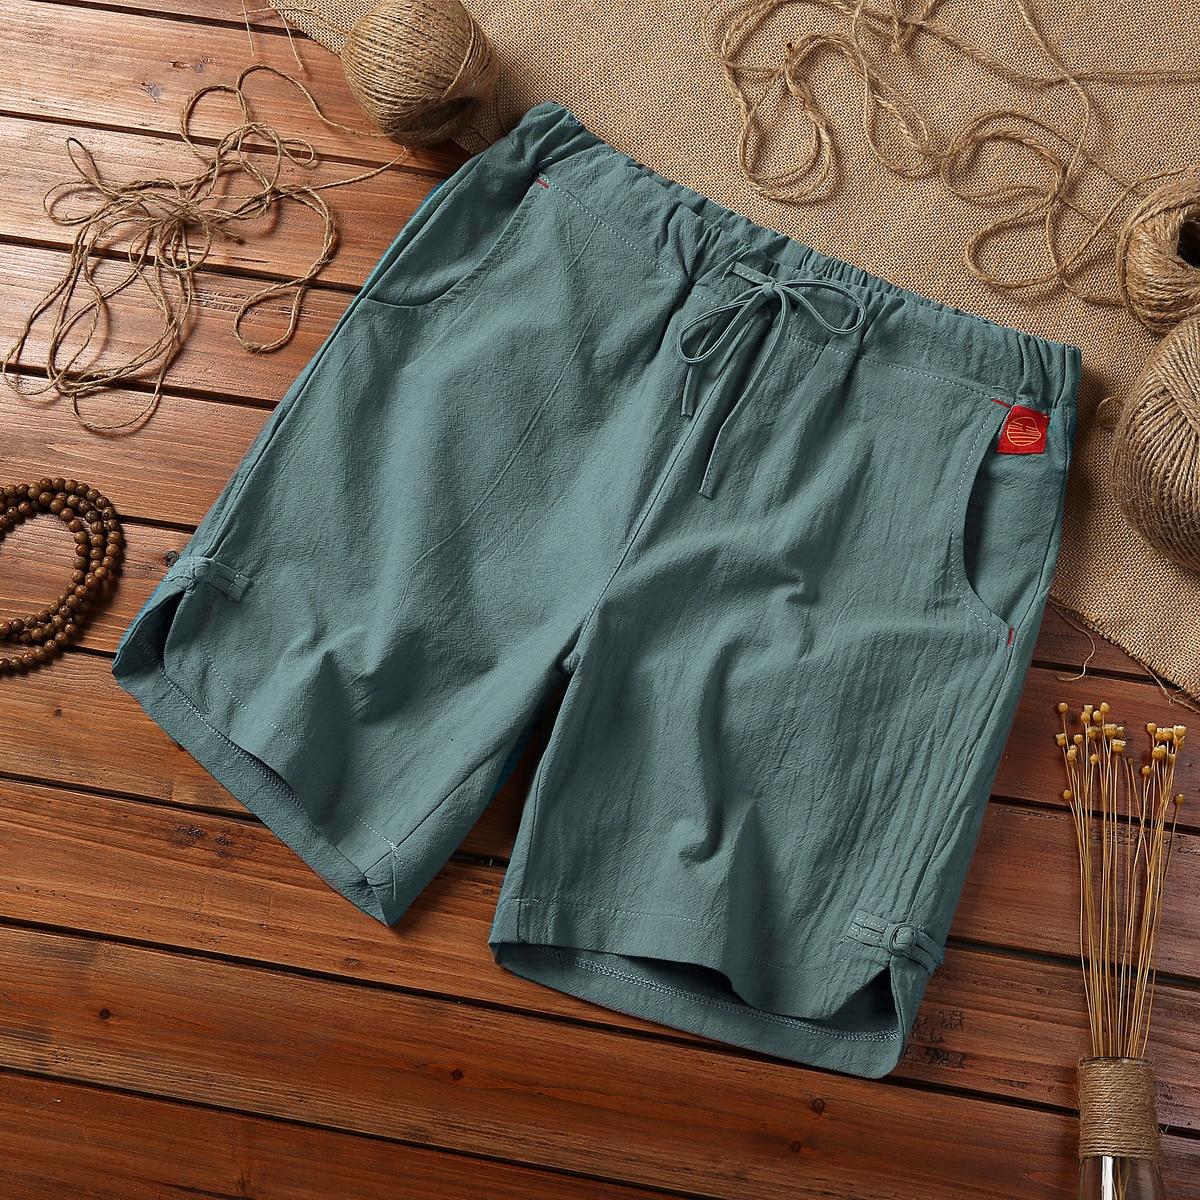 2019 premium brand fashion Men summer loose cotton linen Beach   shorts  /Man slim leisure High quality linen   shorts   Large size 5XL